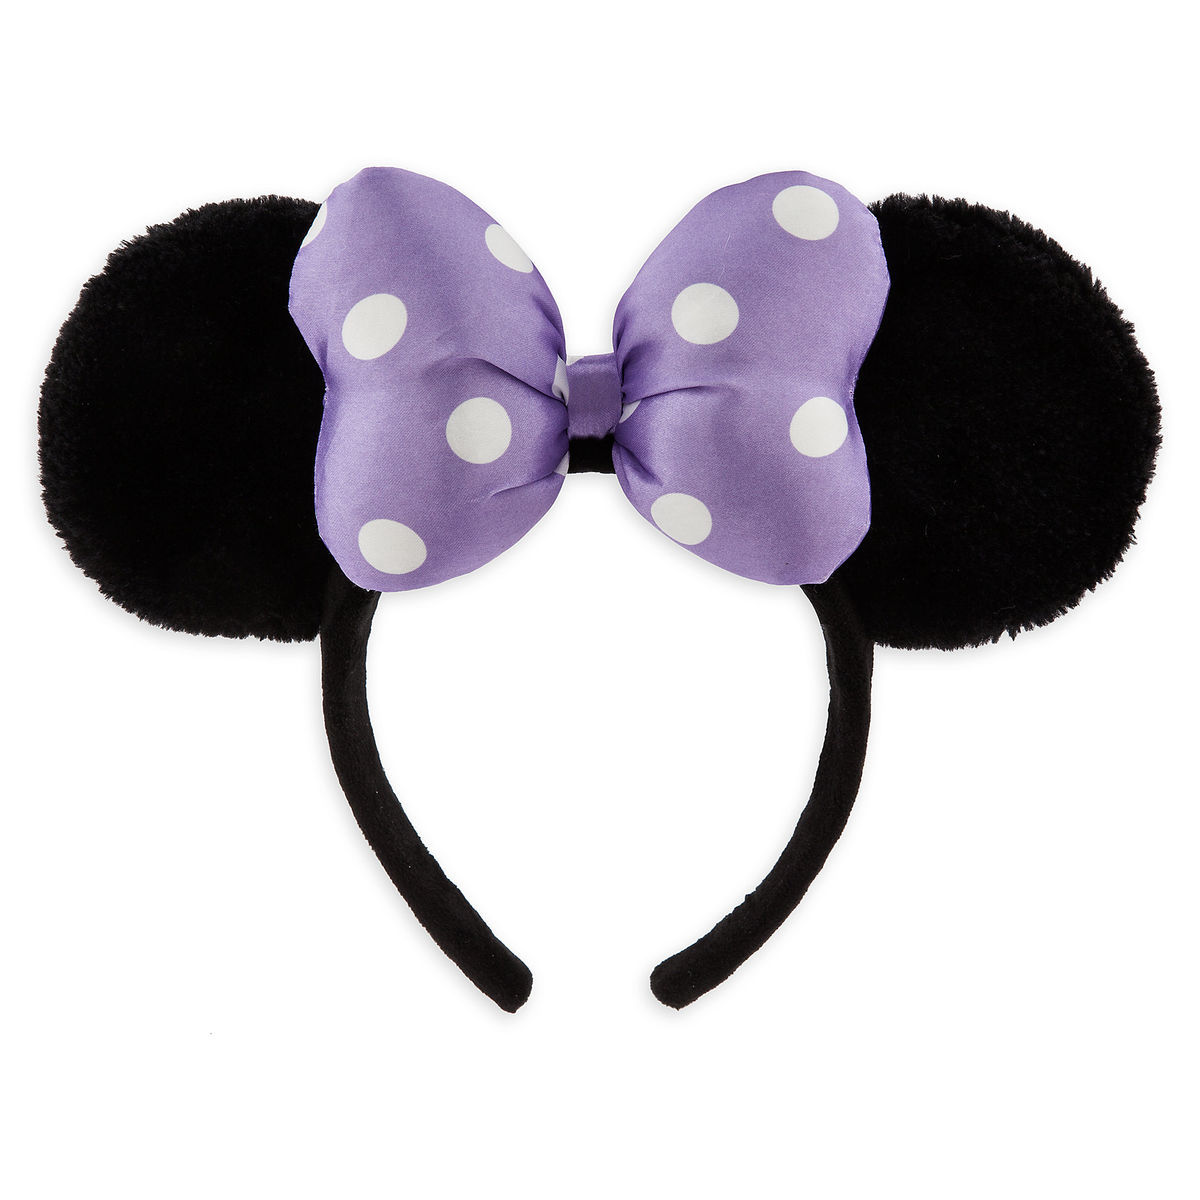 Product Image of Minnie Mouse Ear Headband for Kids - Purple   1 3db6d95e11f